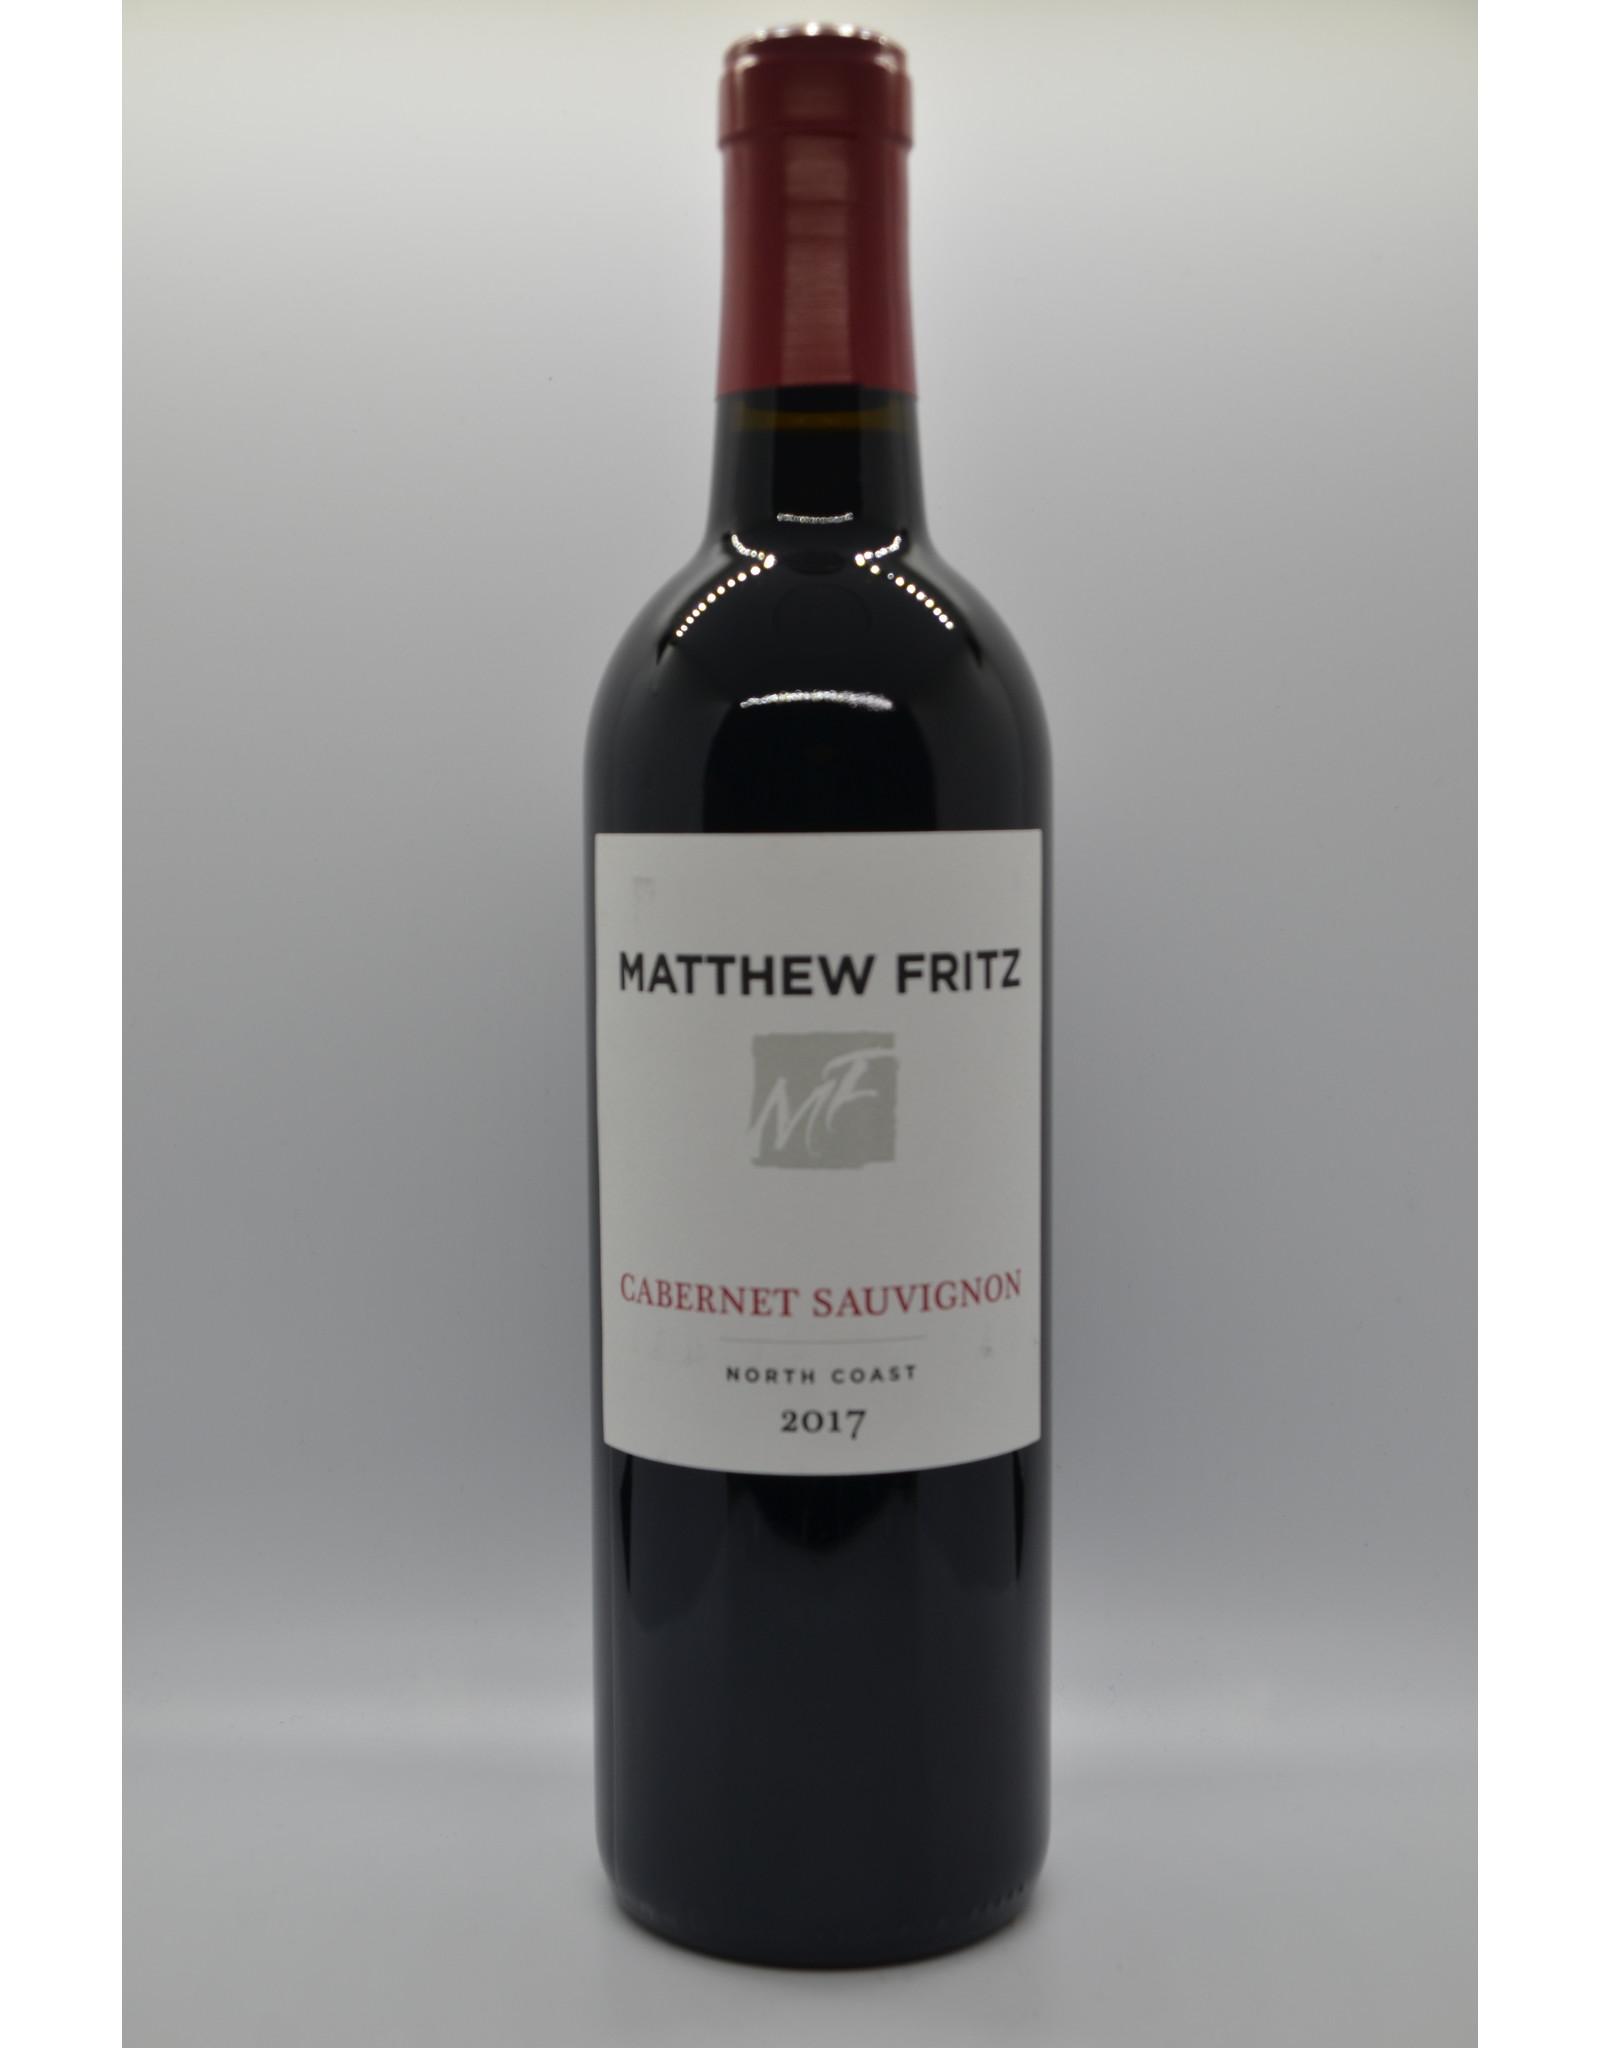 USA Matthew Fritz Cabernet Sauvignon